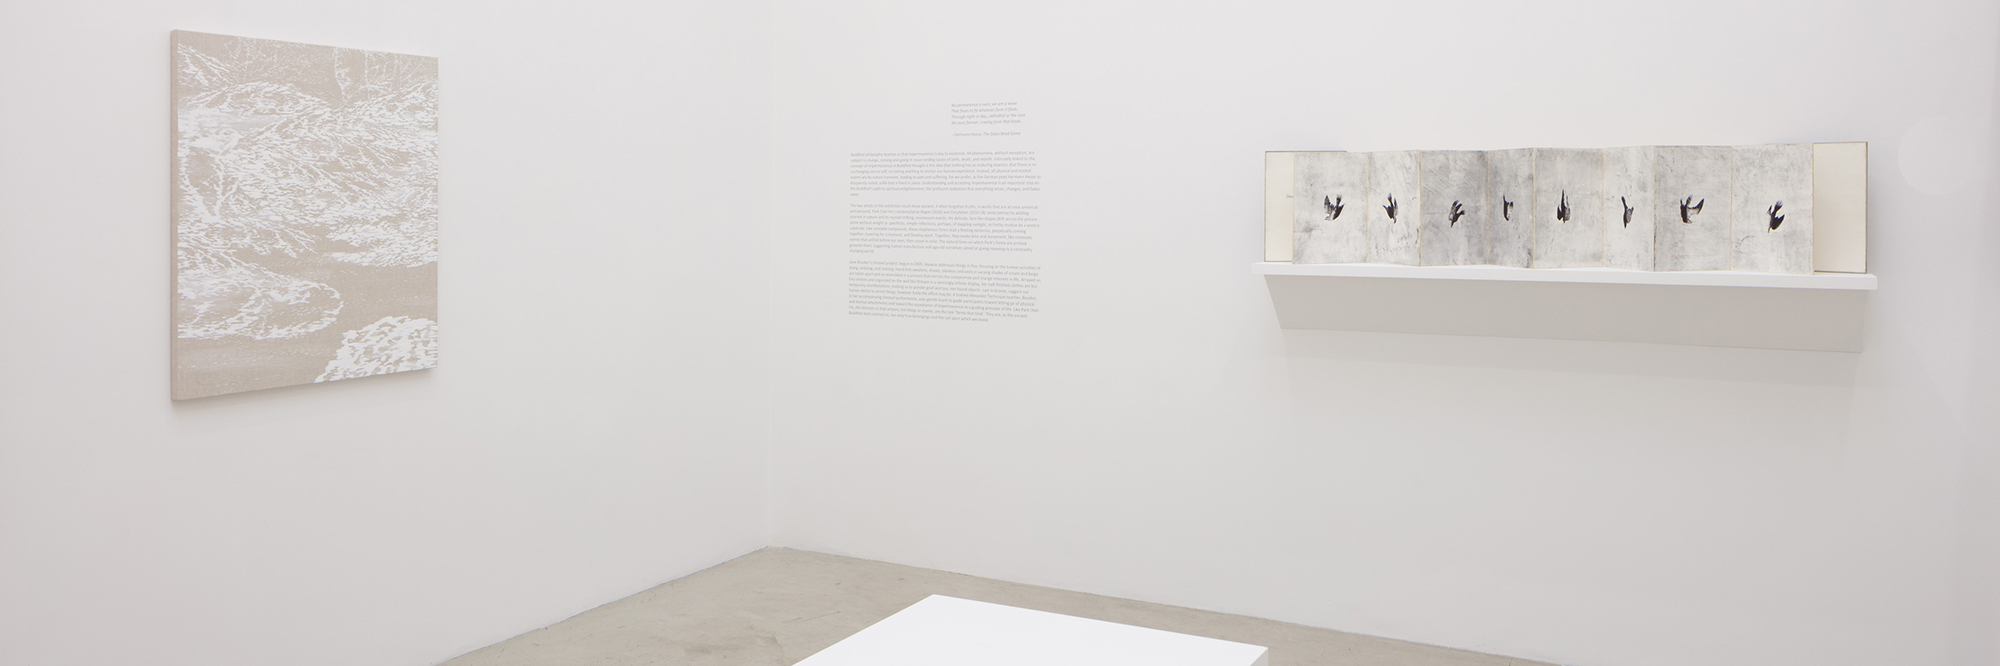 NO PERMANENCE IS OURS   | Jane Brucker, Park Chel Ho | Jan 5 — Feb 2, 2019 |  press release  |  catalogue